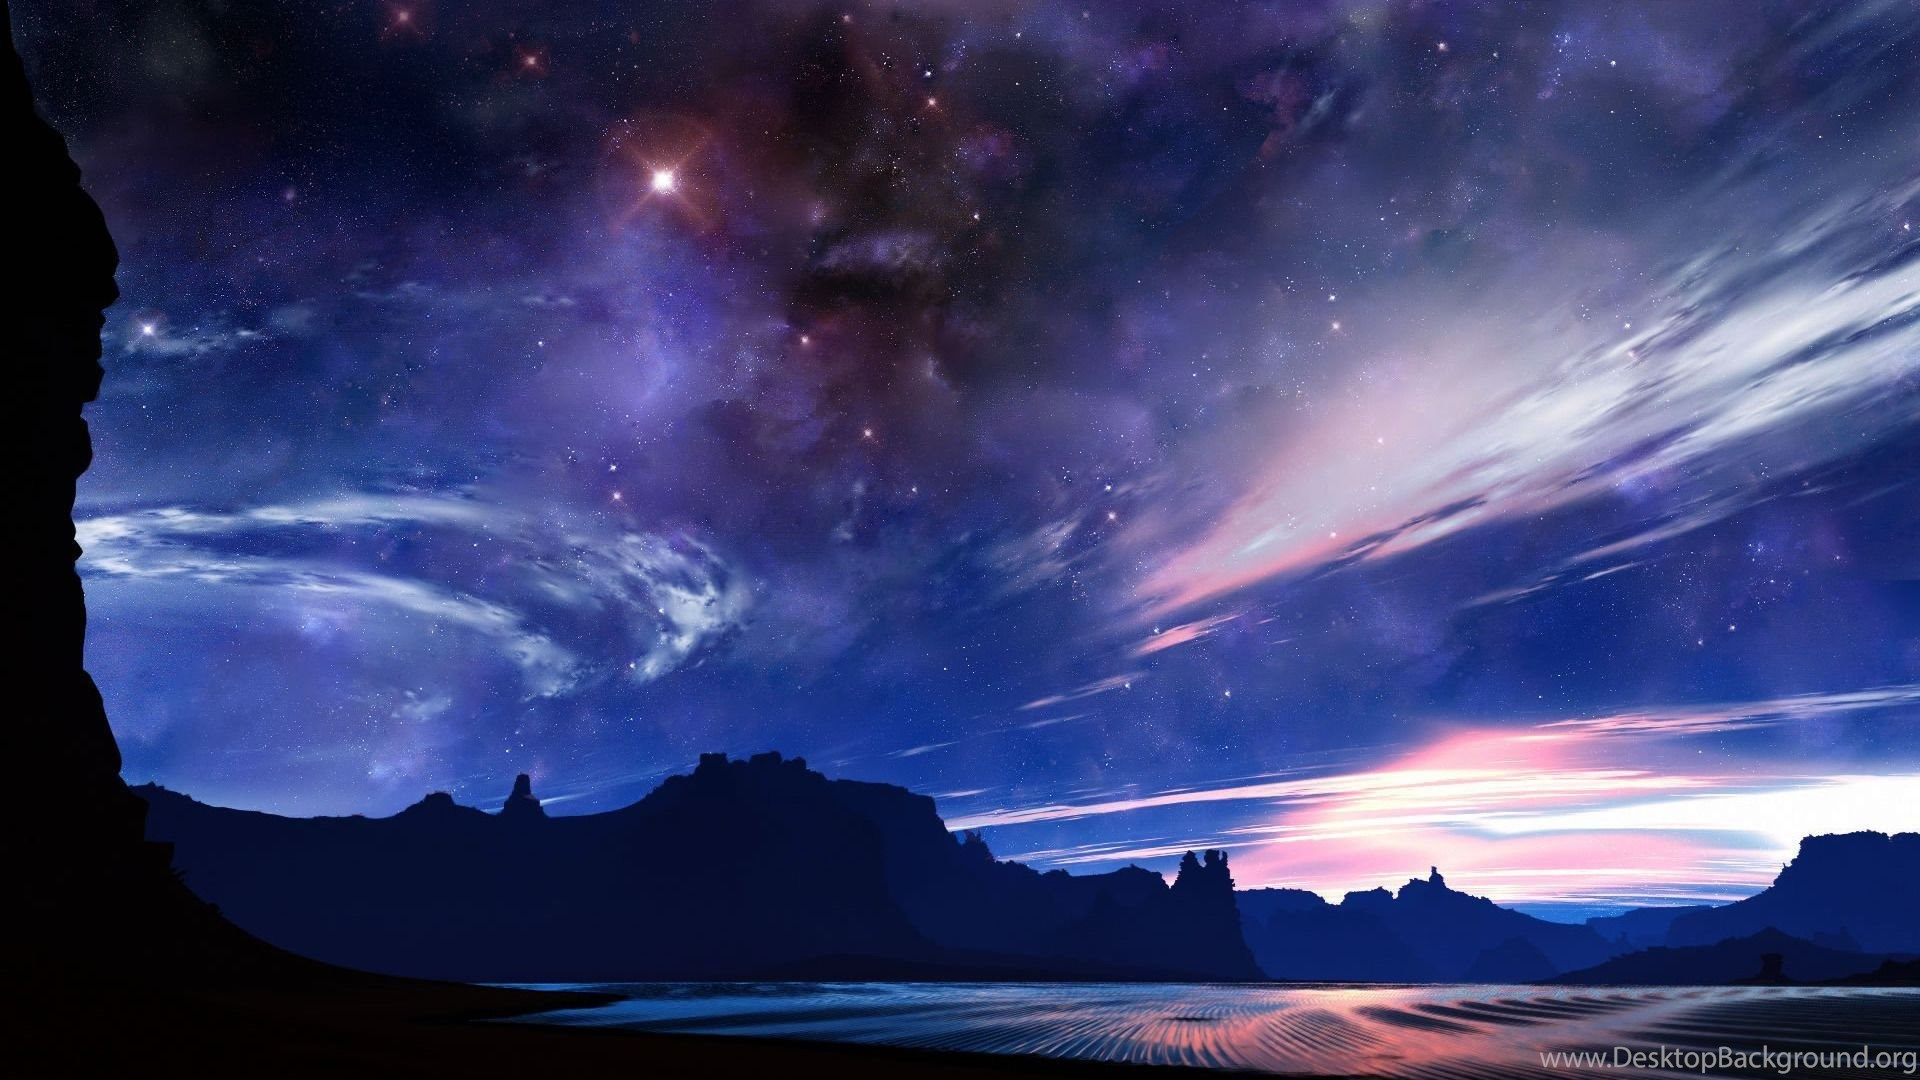 Night Sky Wallpapers Hd Resolution Desktop Background